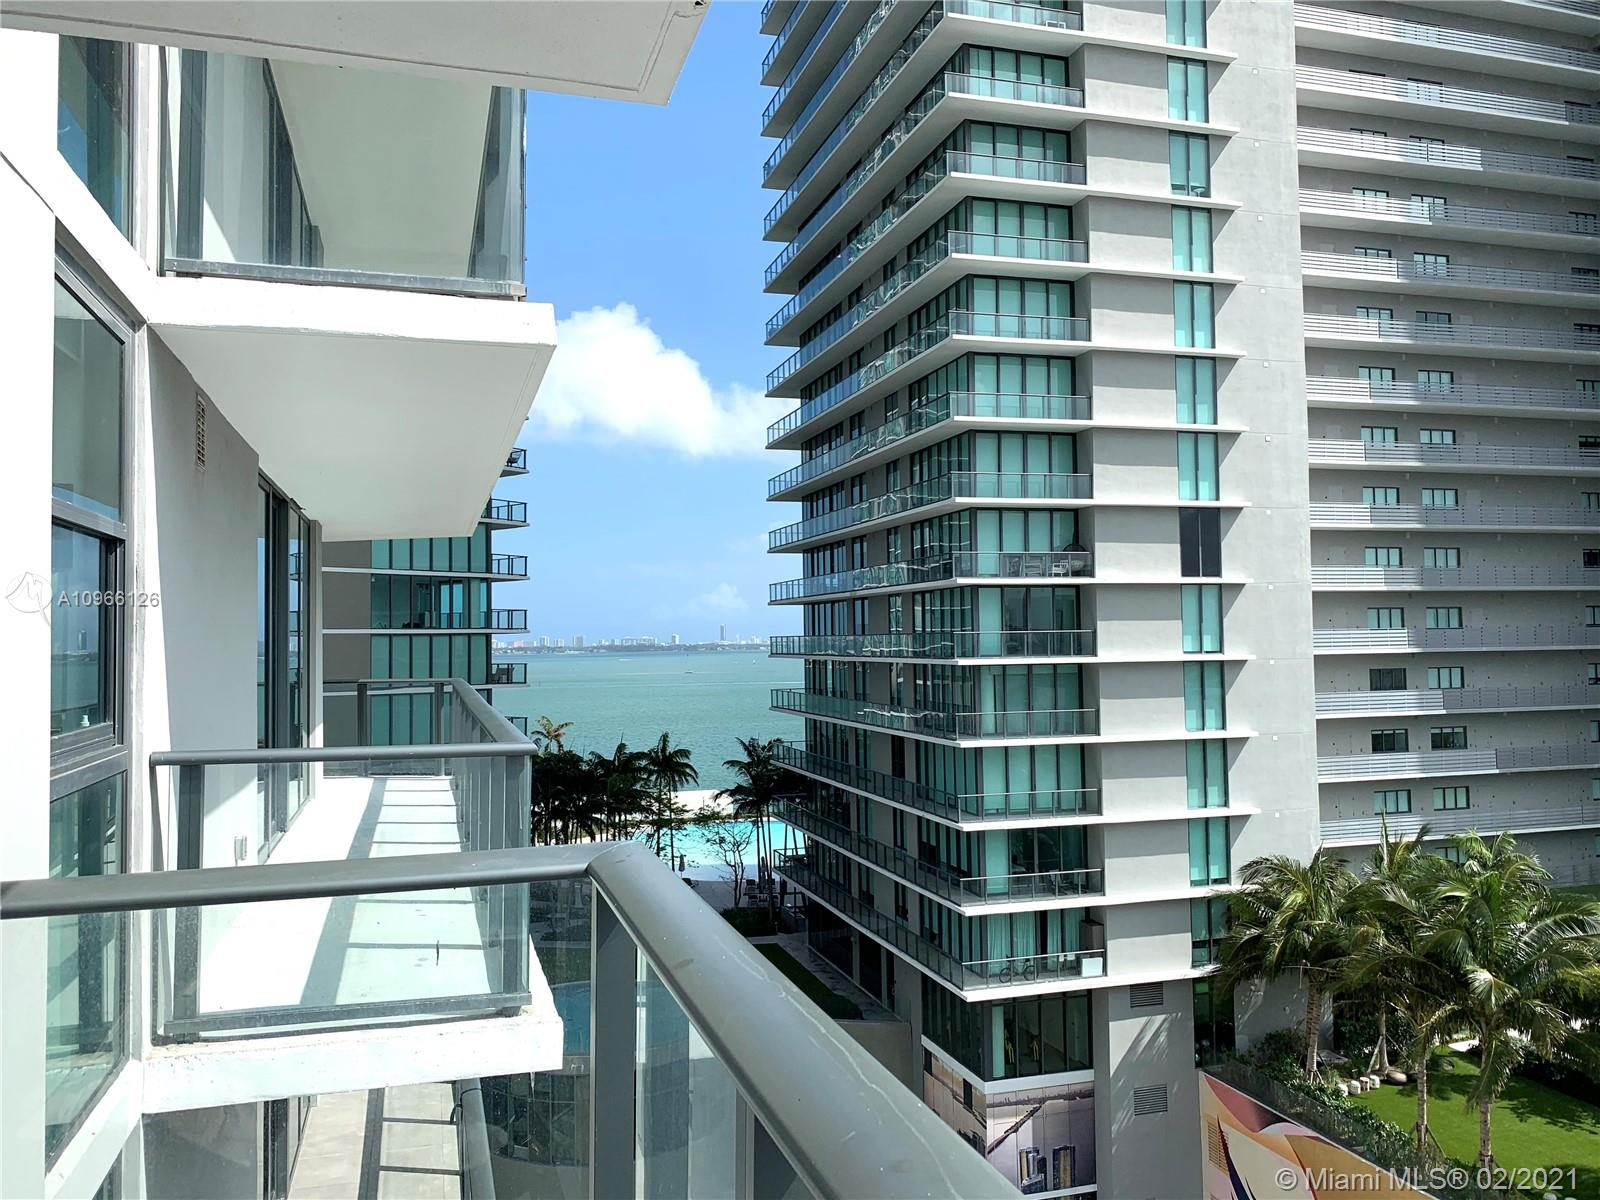 Paraiso Bayviews #807 - 501 NE 31 Street #807, Miami, FL 33137